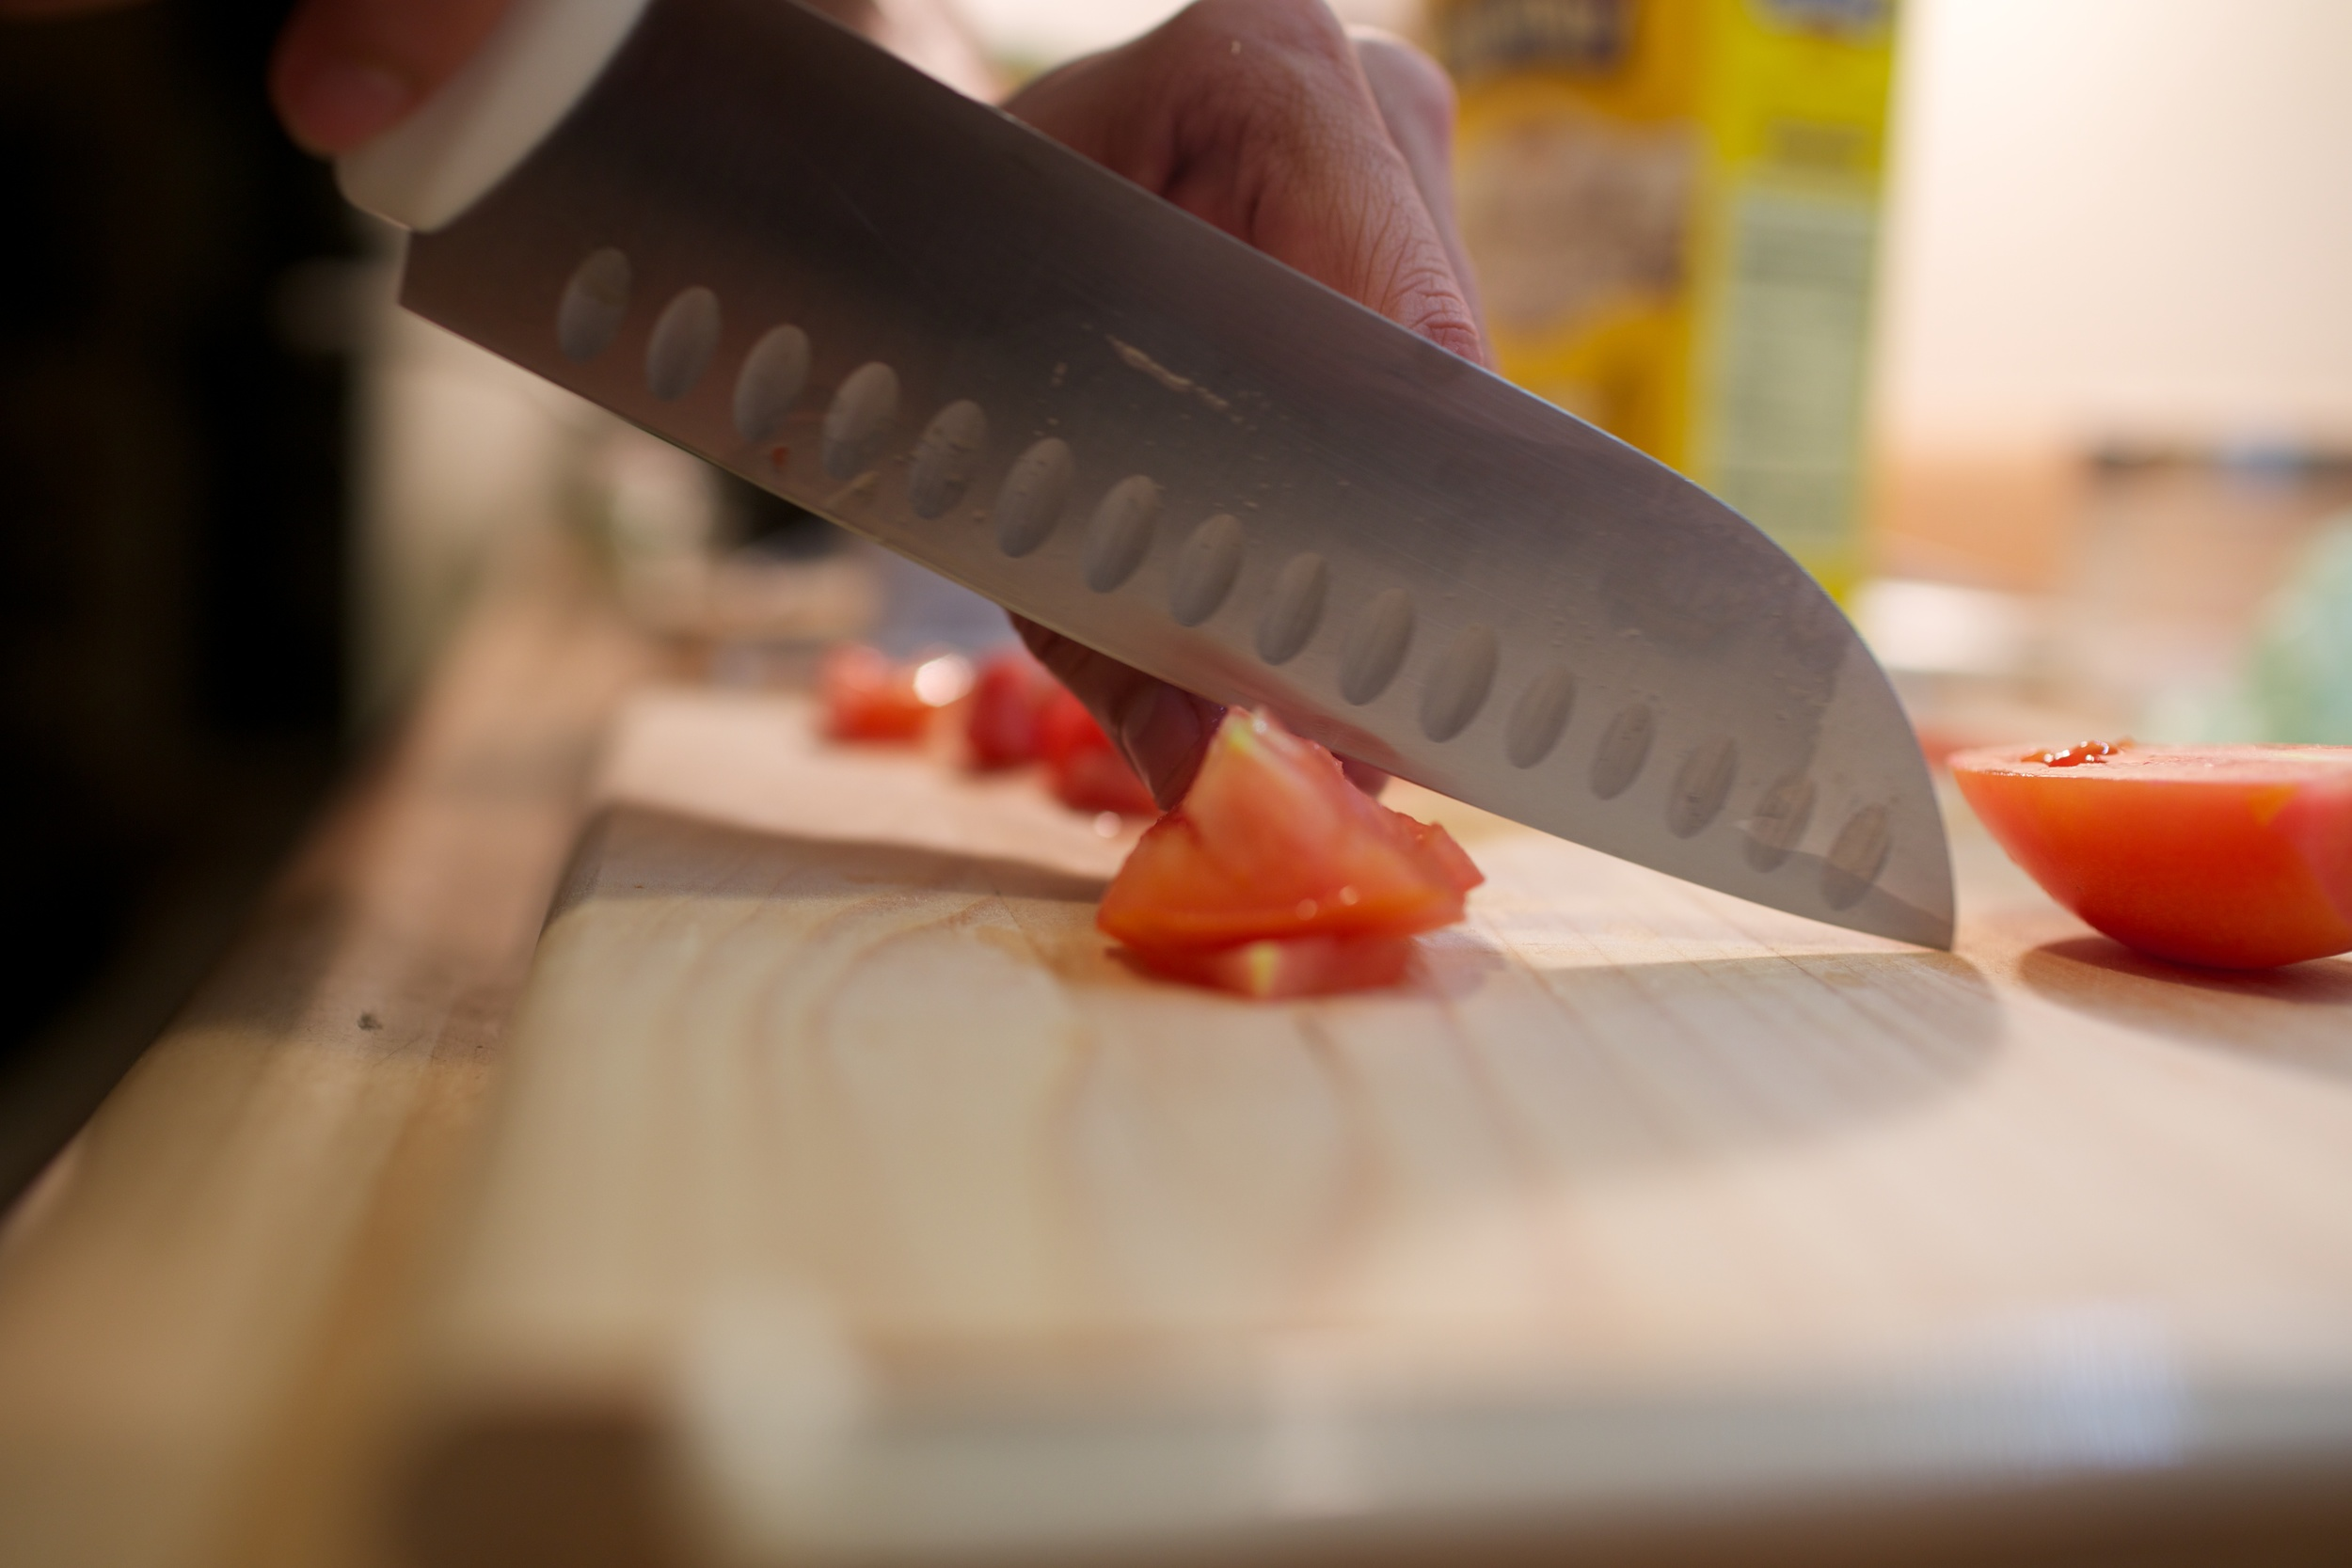 Kunal slicing tomatos, and hopefully not a finger.